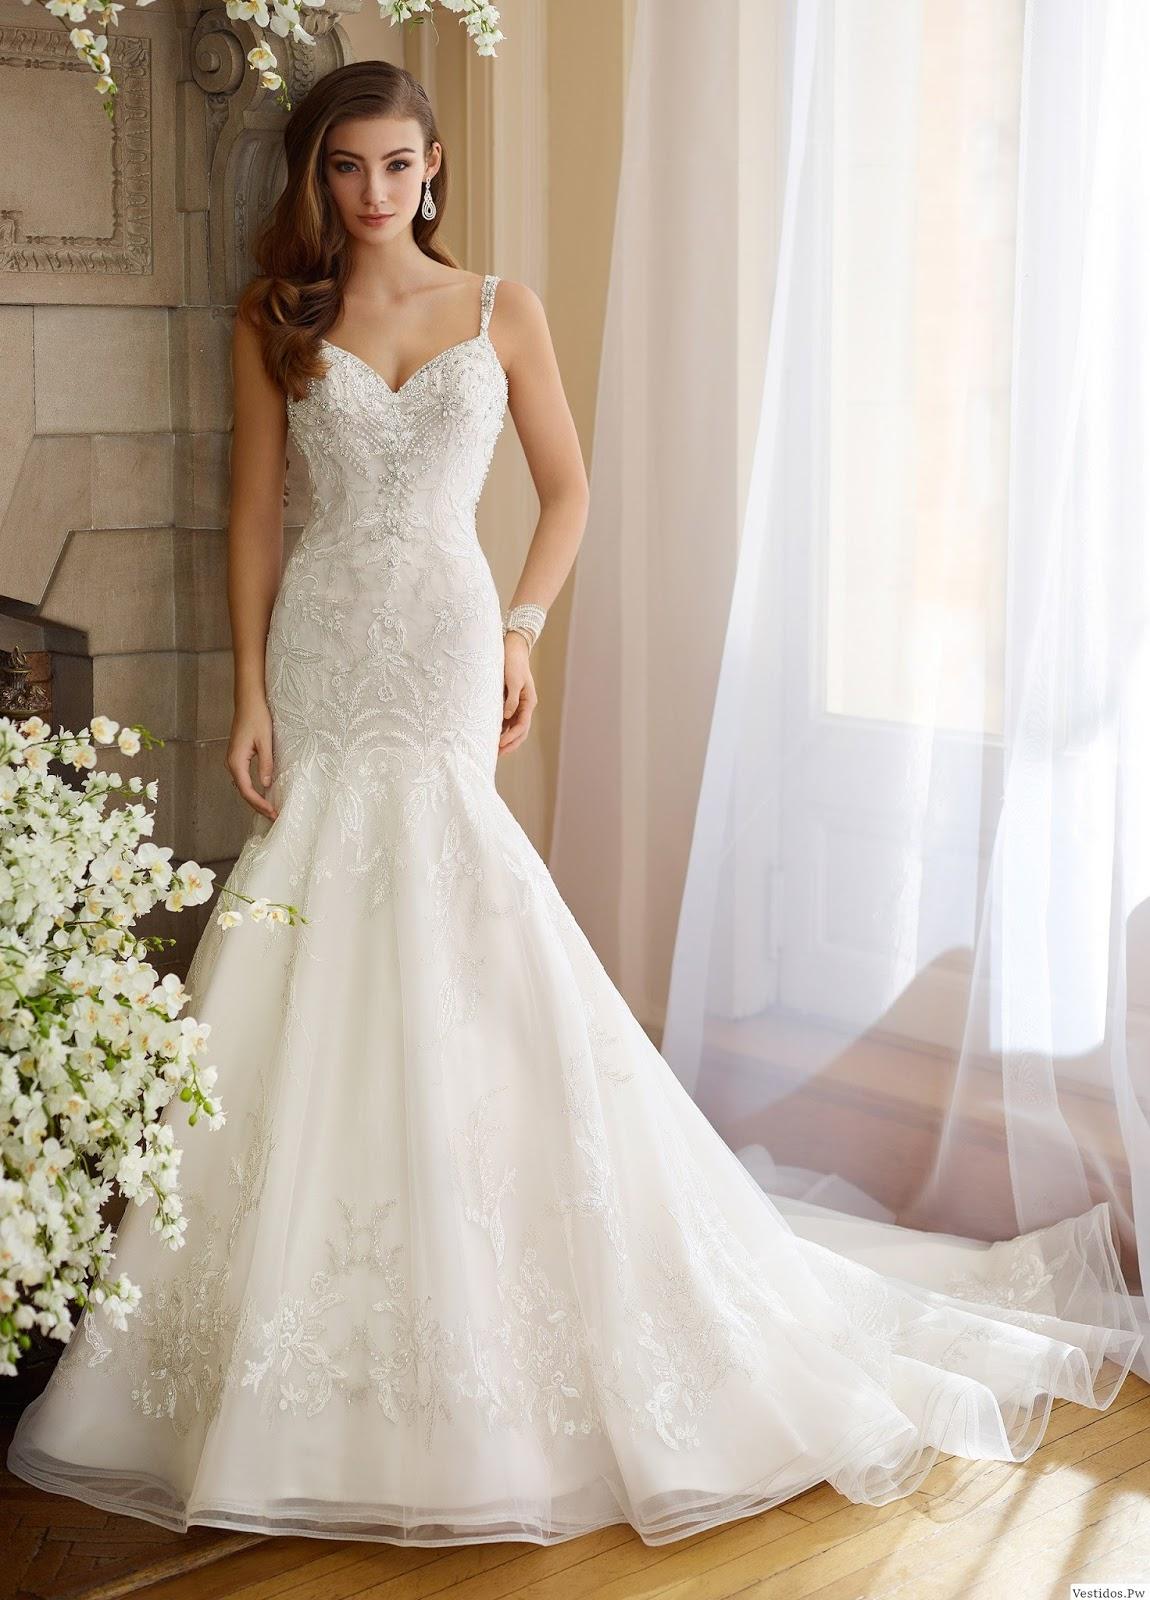 Moda en vestidos de novia 2018